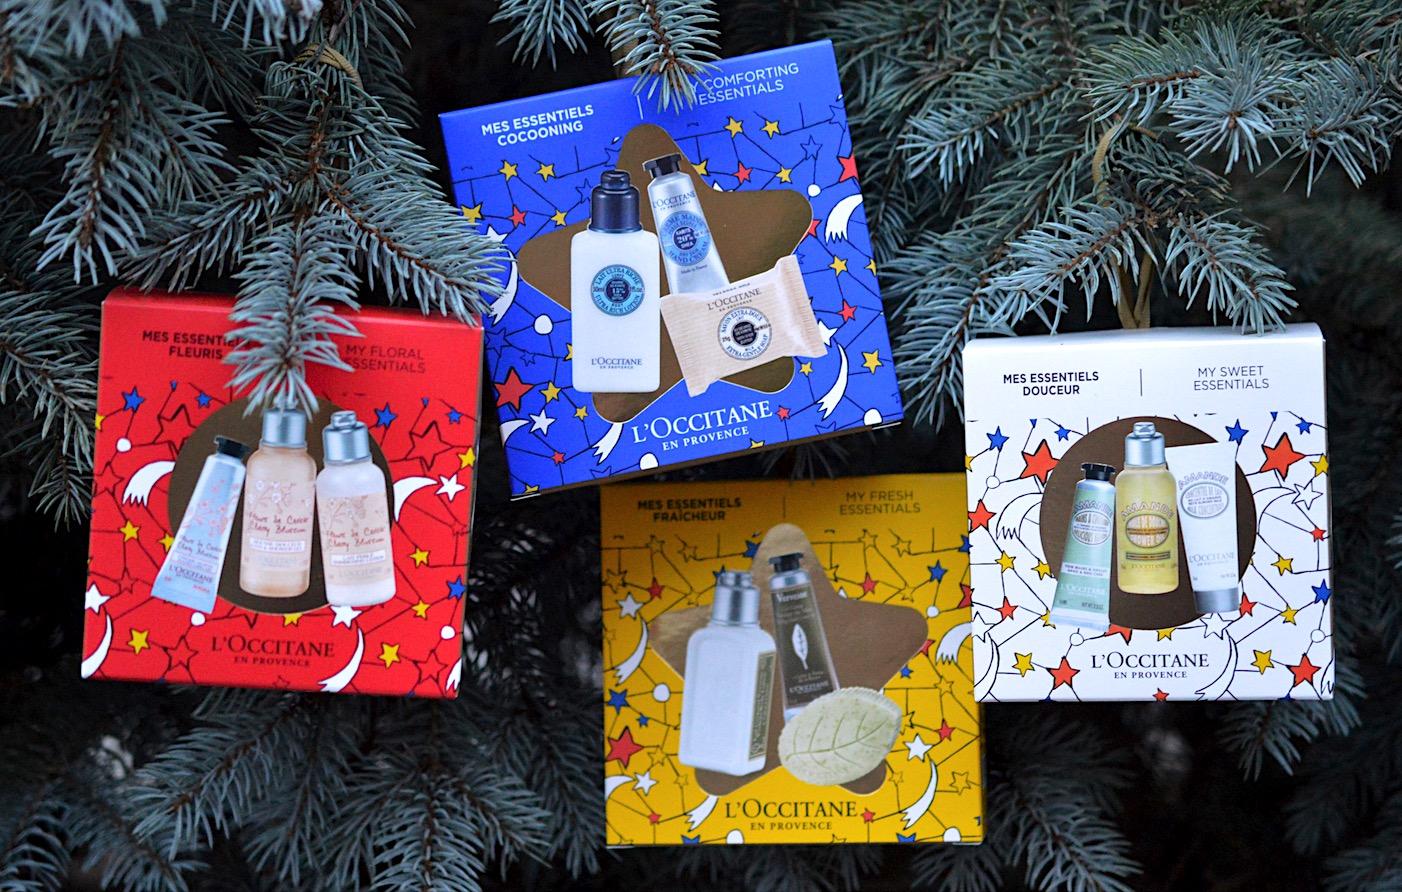 L'Occitane Christmas Ornaments